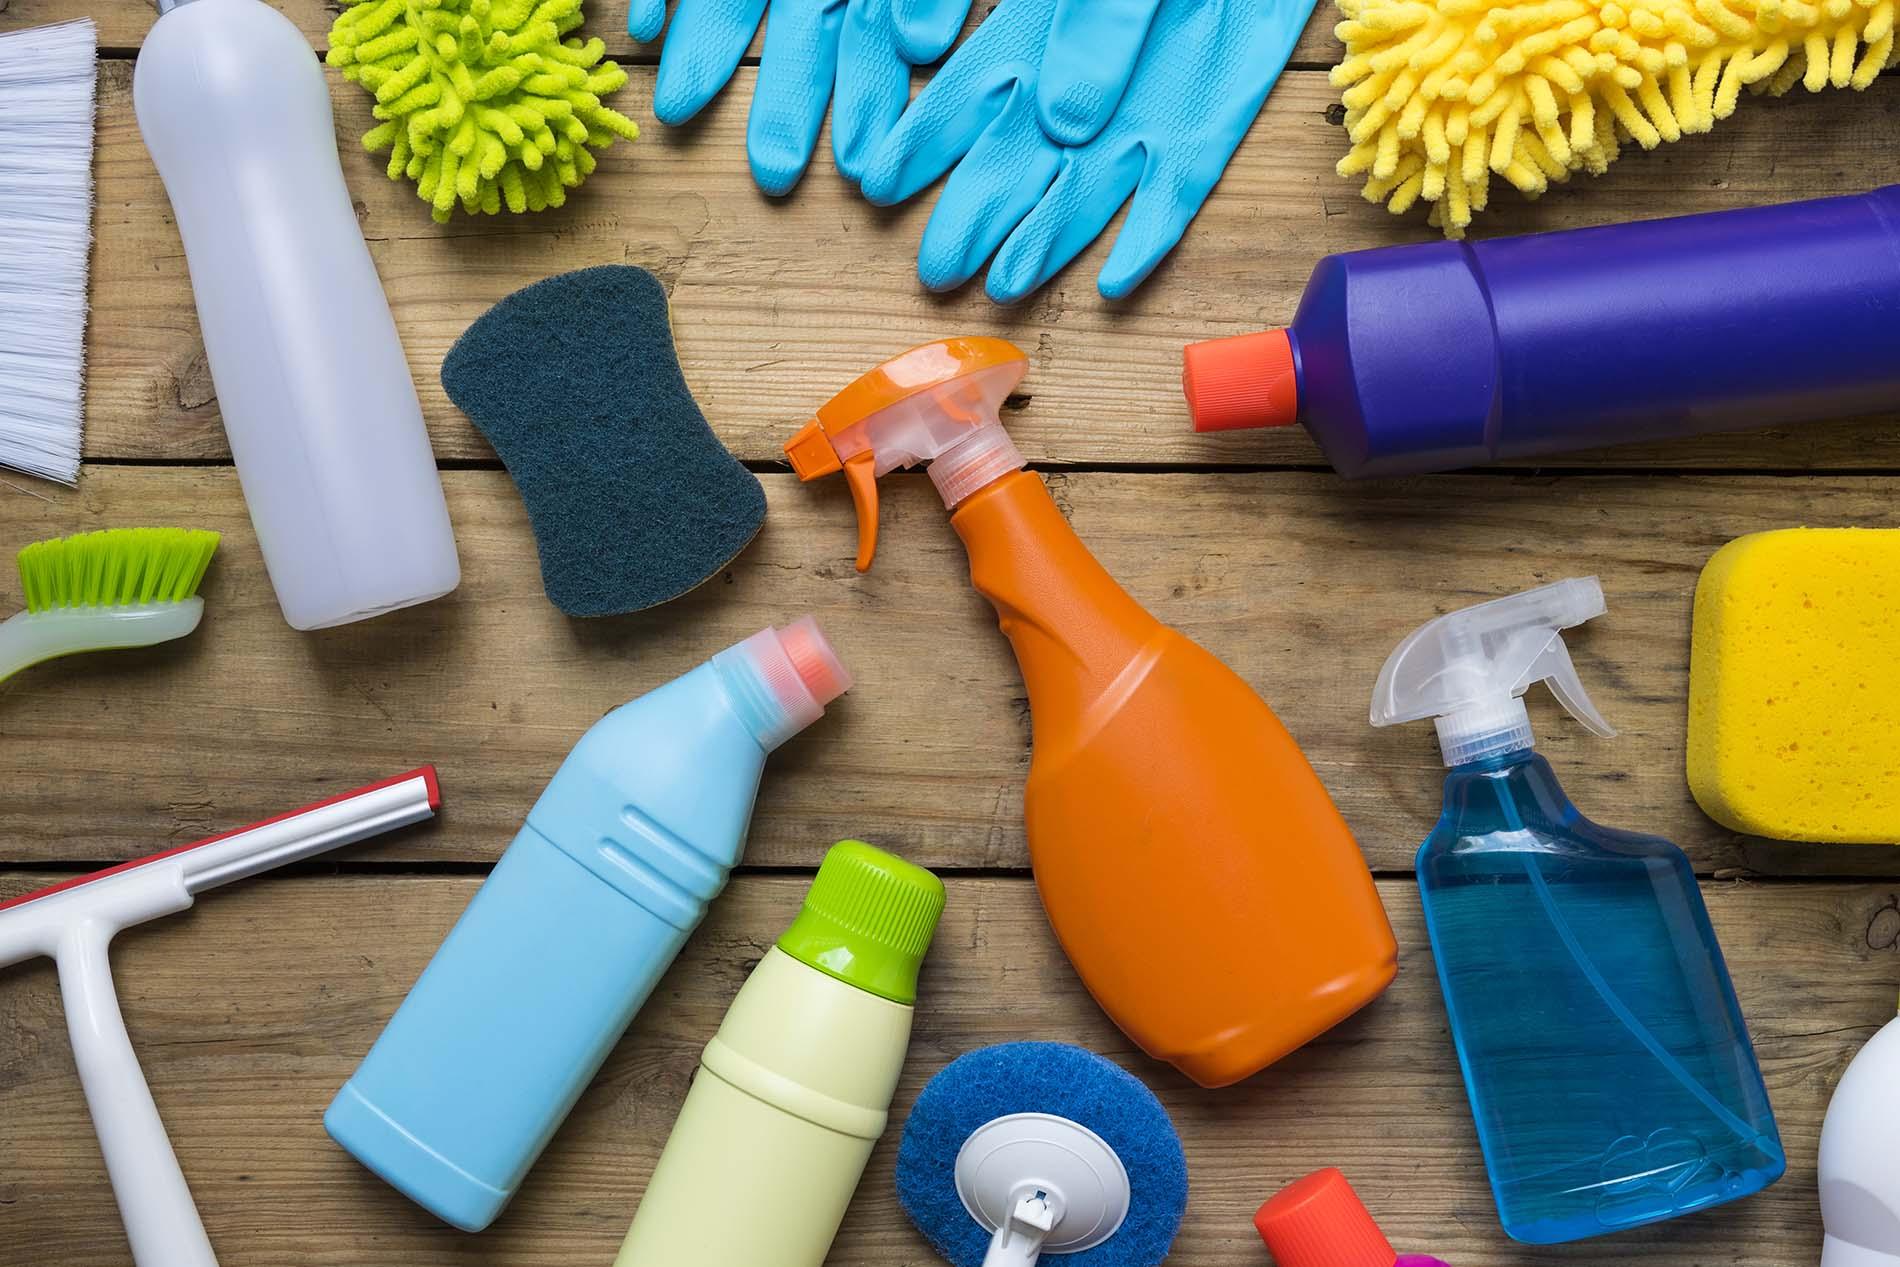 средства для чистки диванов